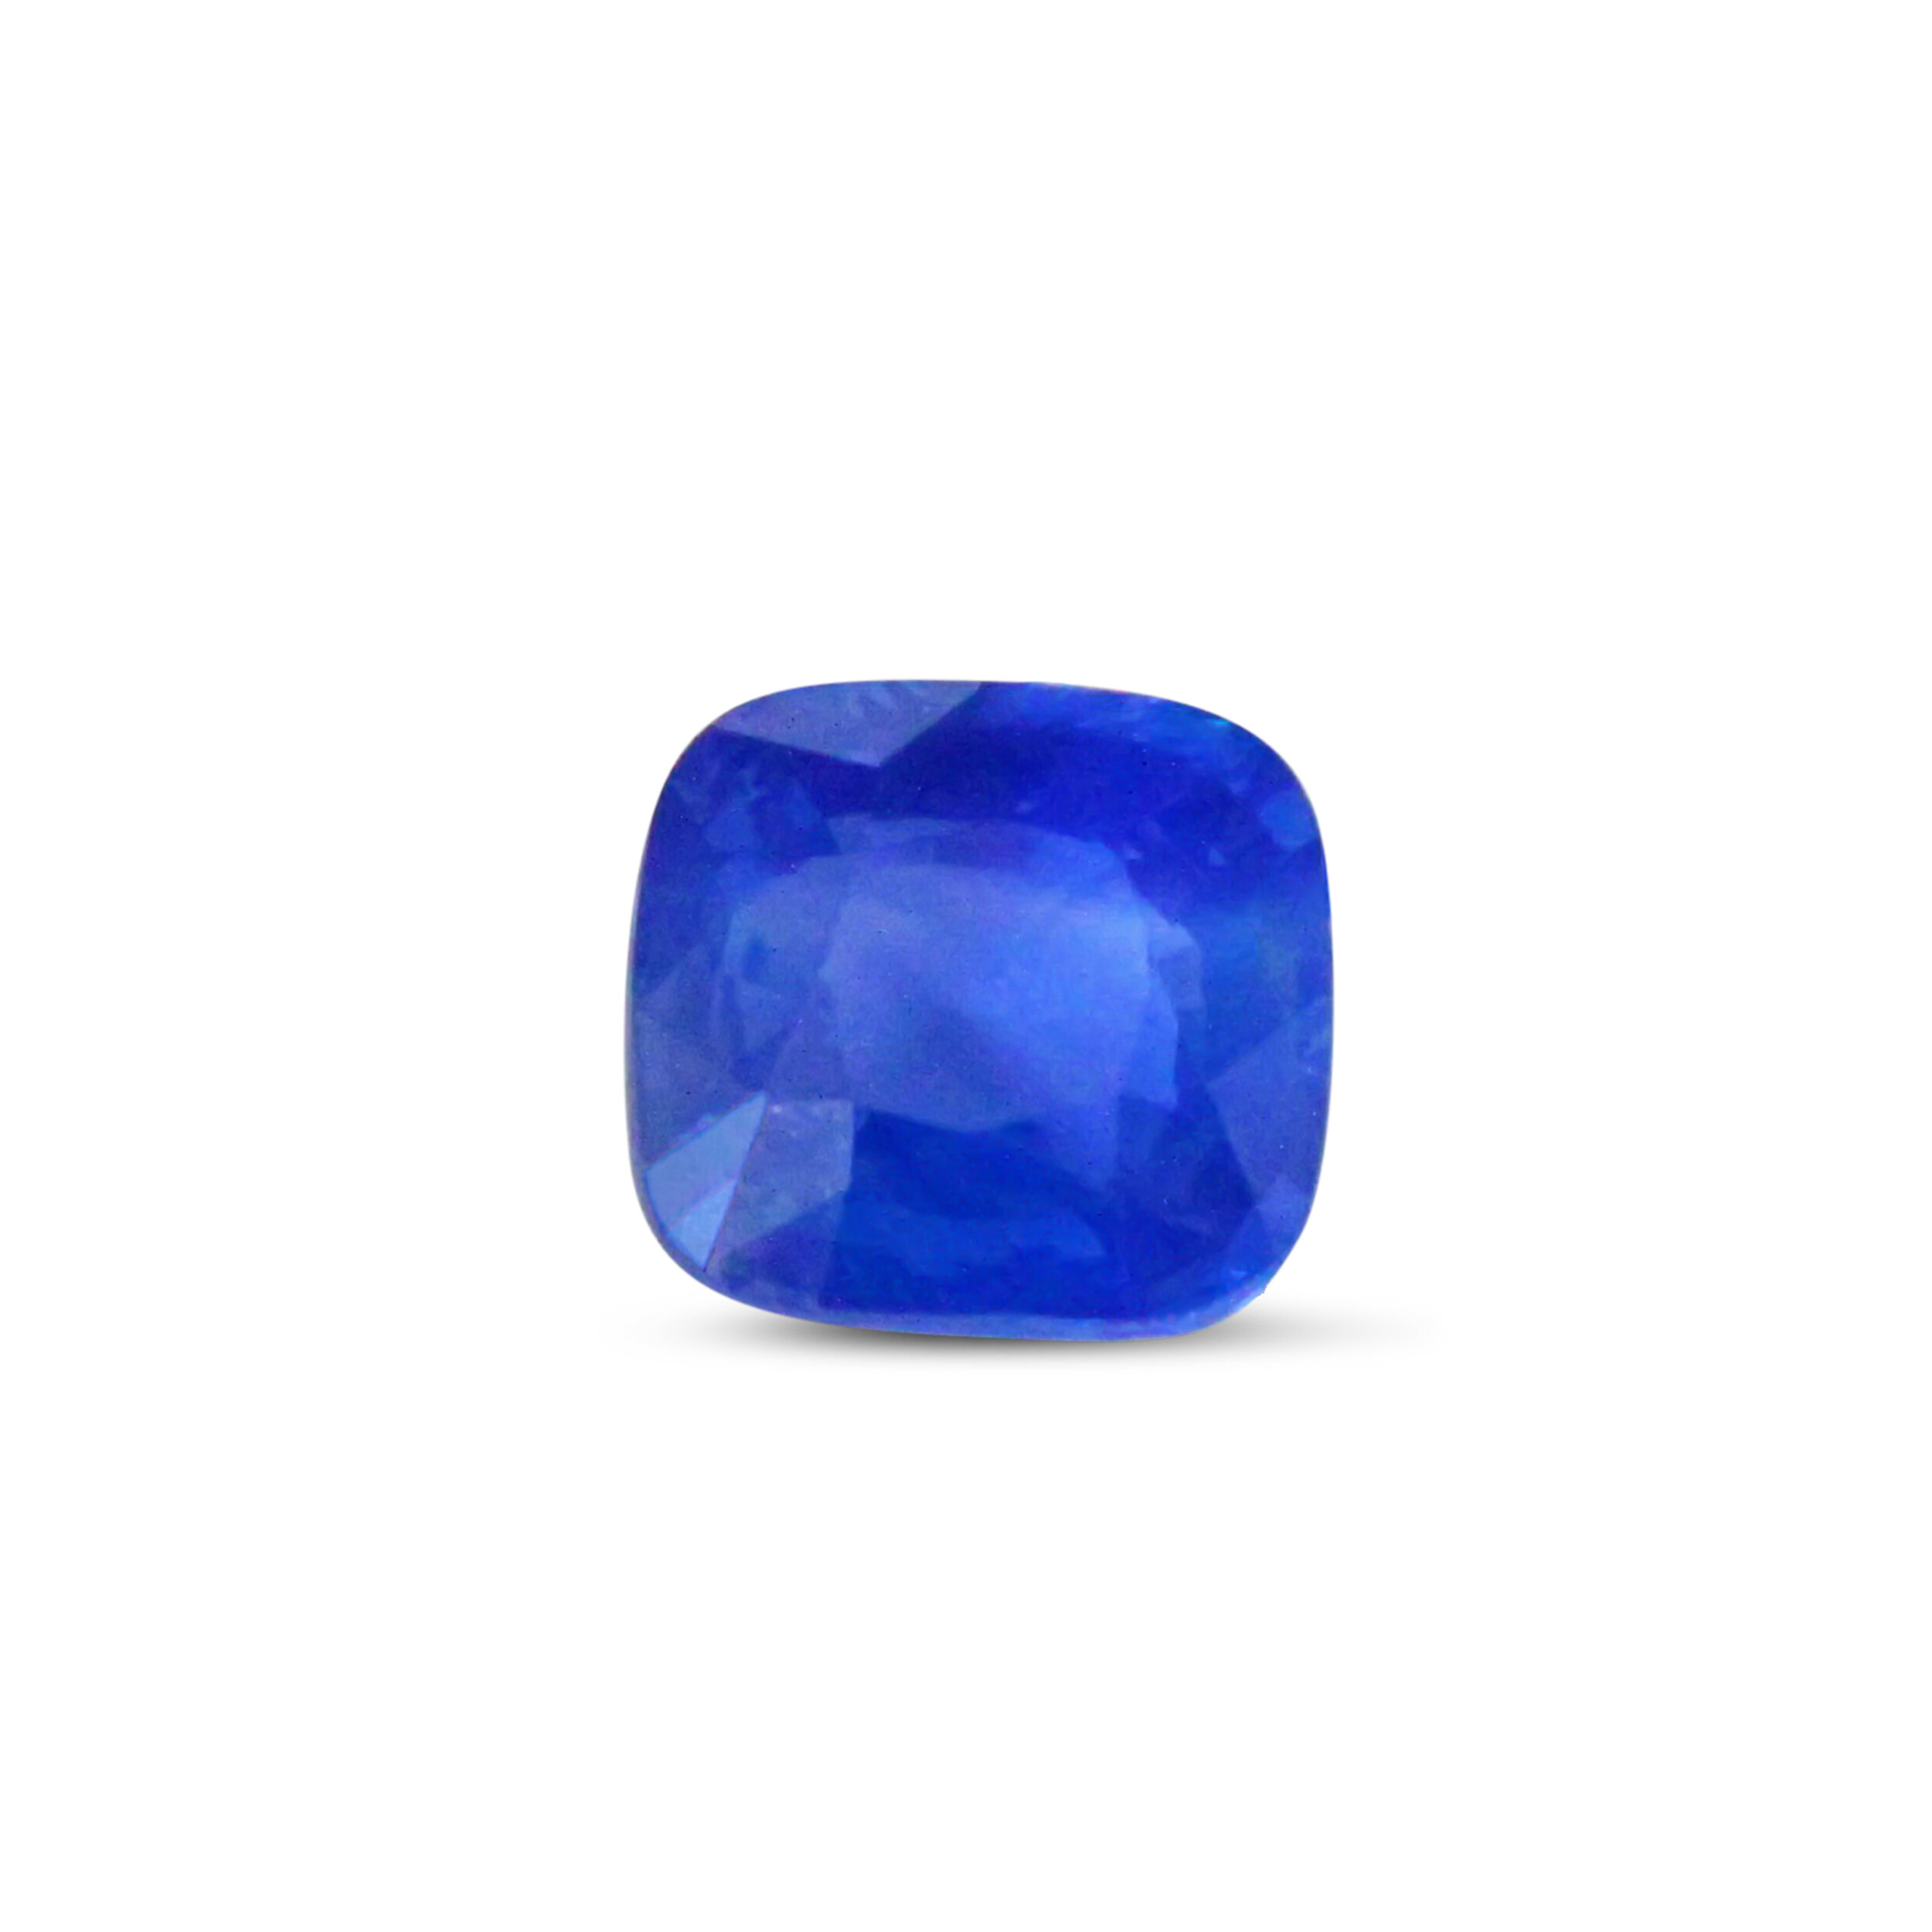 1.50 ct Unheated Madagascar Sapphire, GIA.jpg